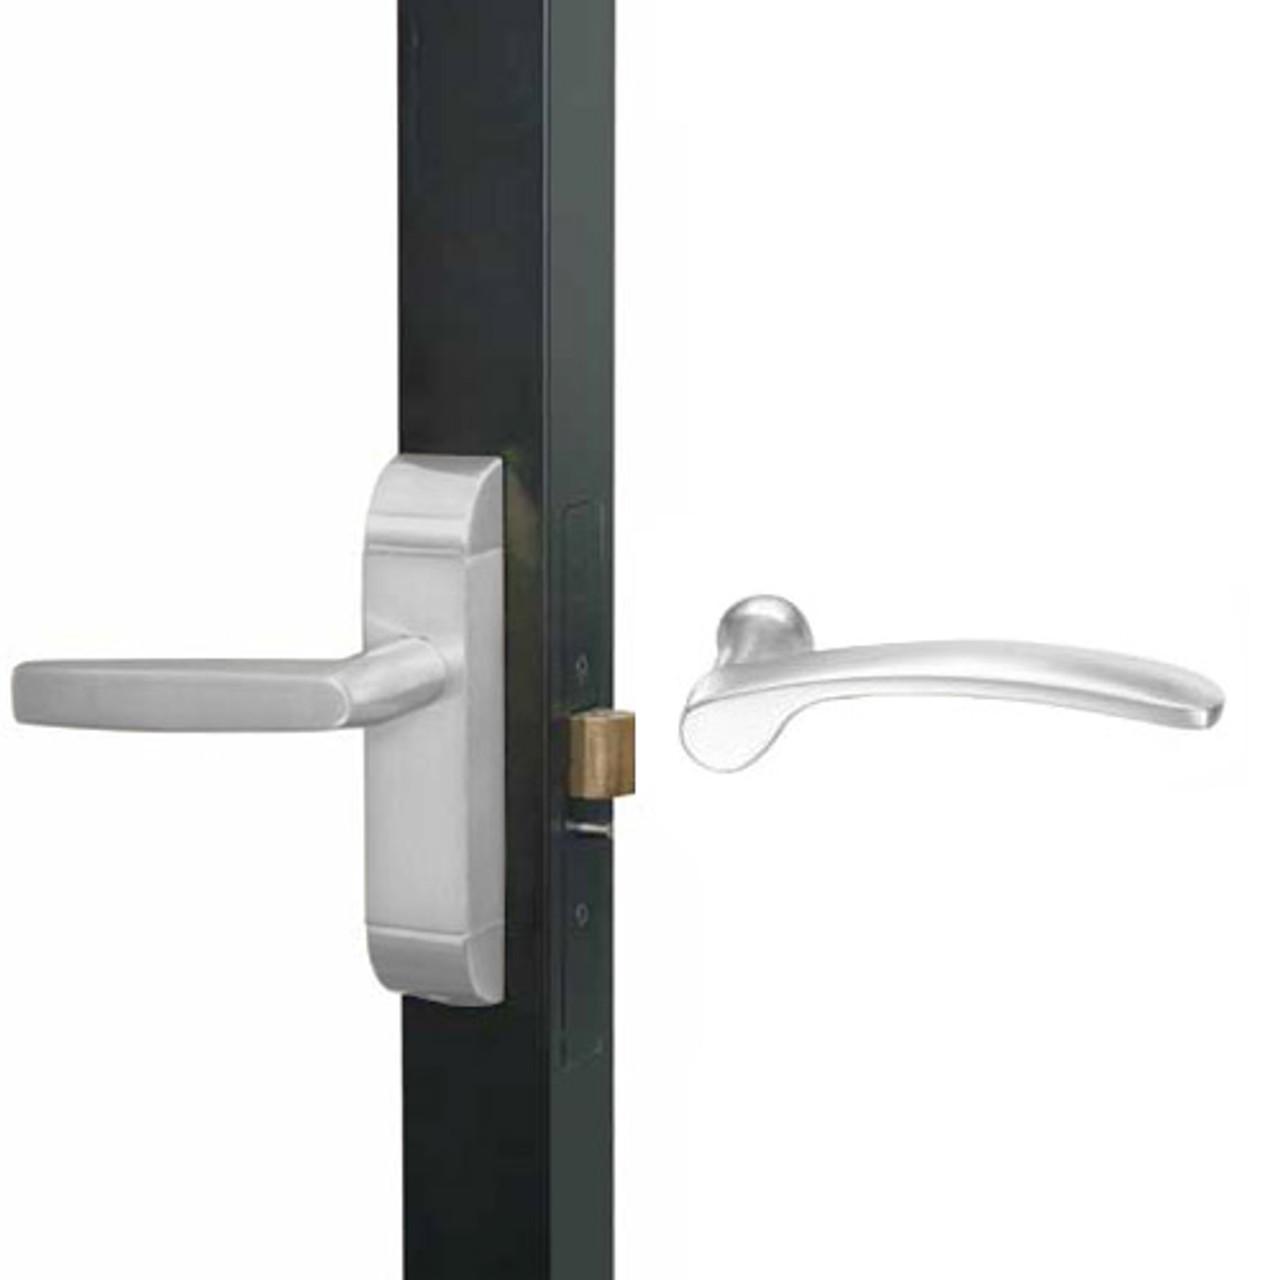 4600M-MN-631-US32 Adams Rite MN Designer Deadlatch handle in Bright Stainless Finish